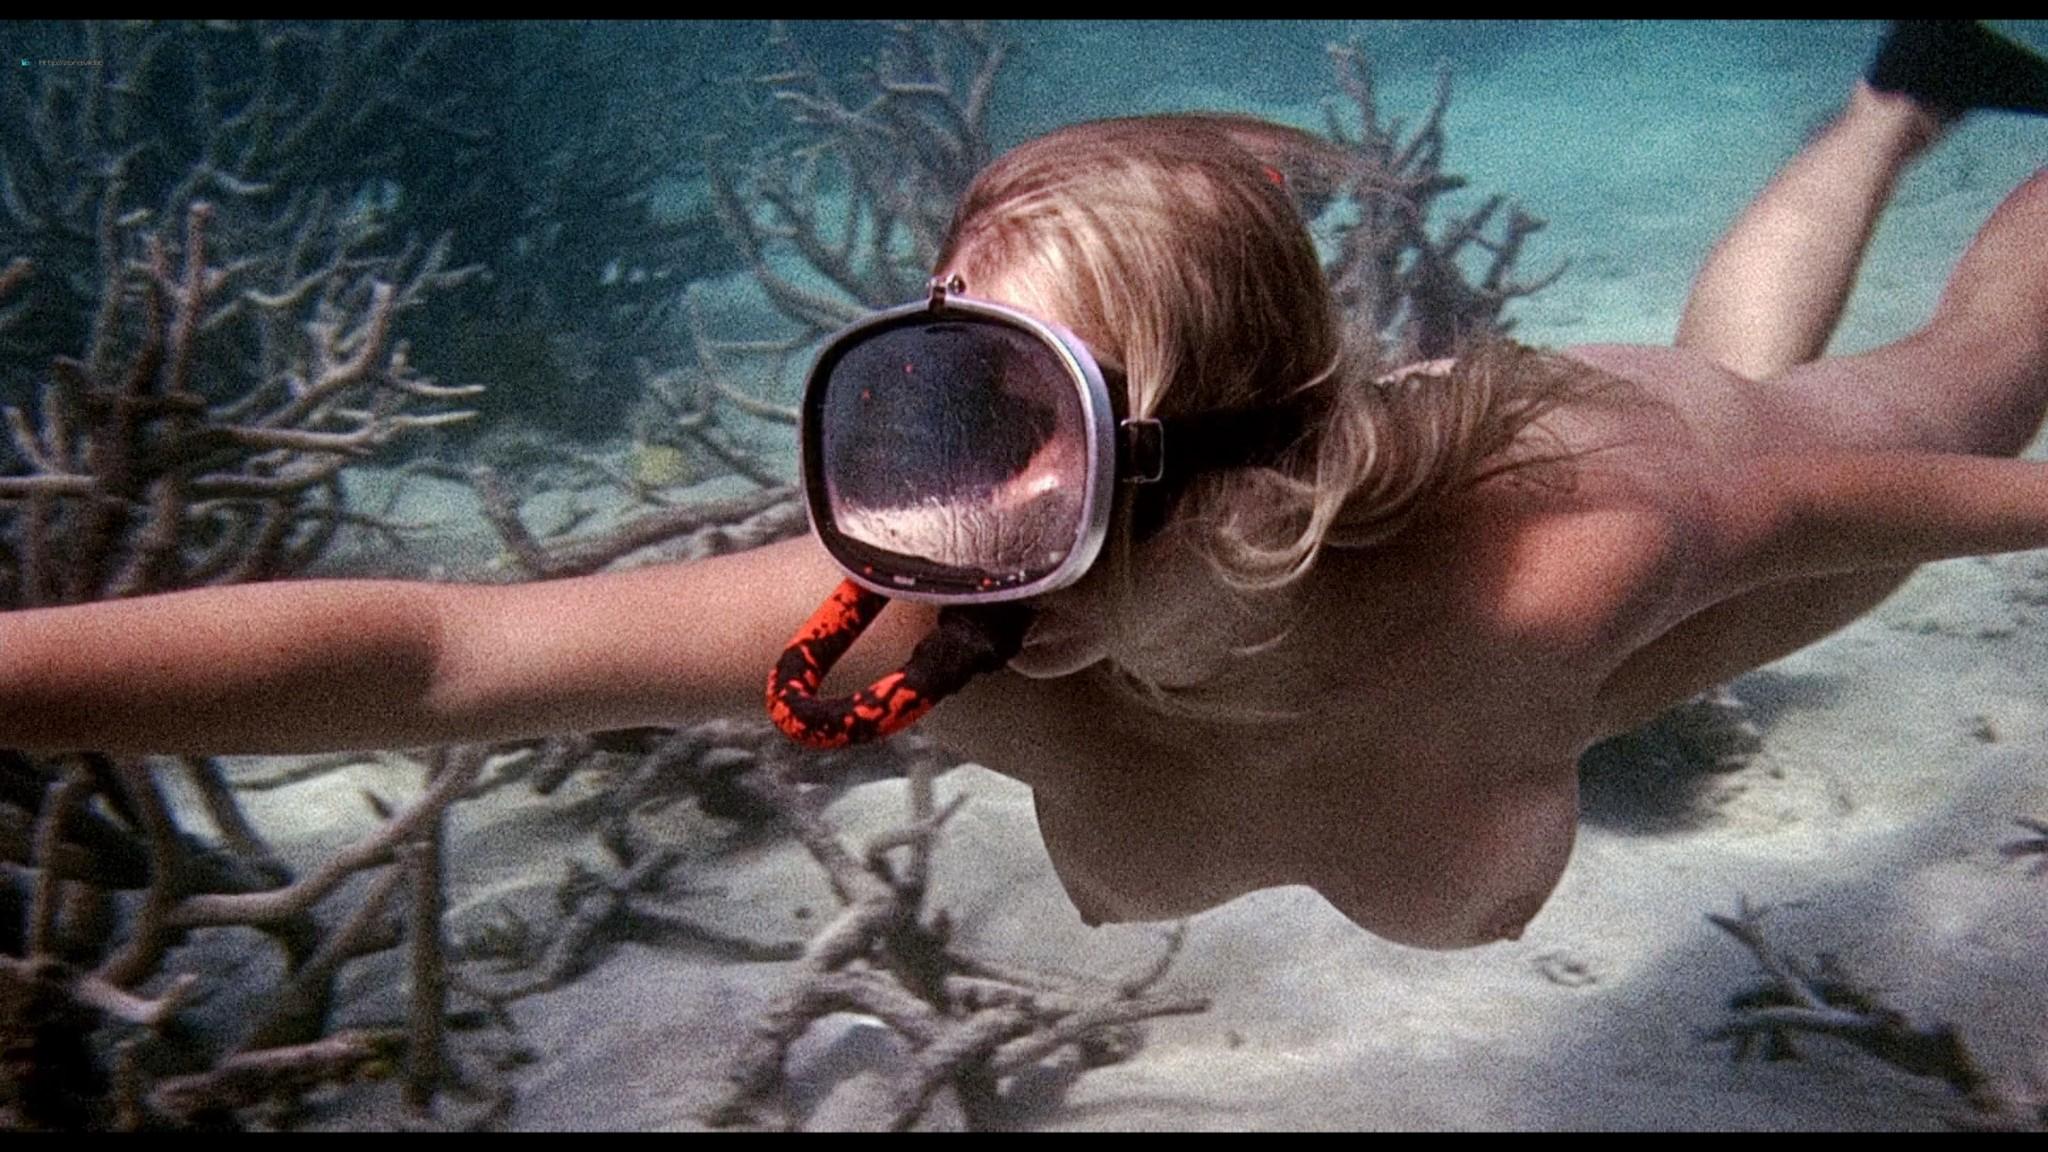 Helen Mirren nude skinny dipping Clarissa Kaye-Mason nude sex - Age of Consent (1969) HD 1080p BluRay Remux (12)